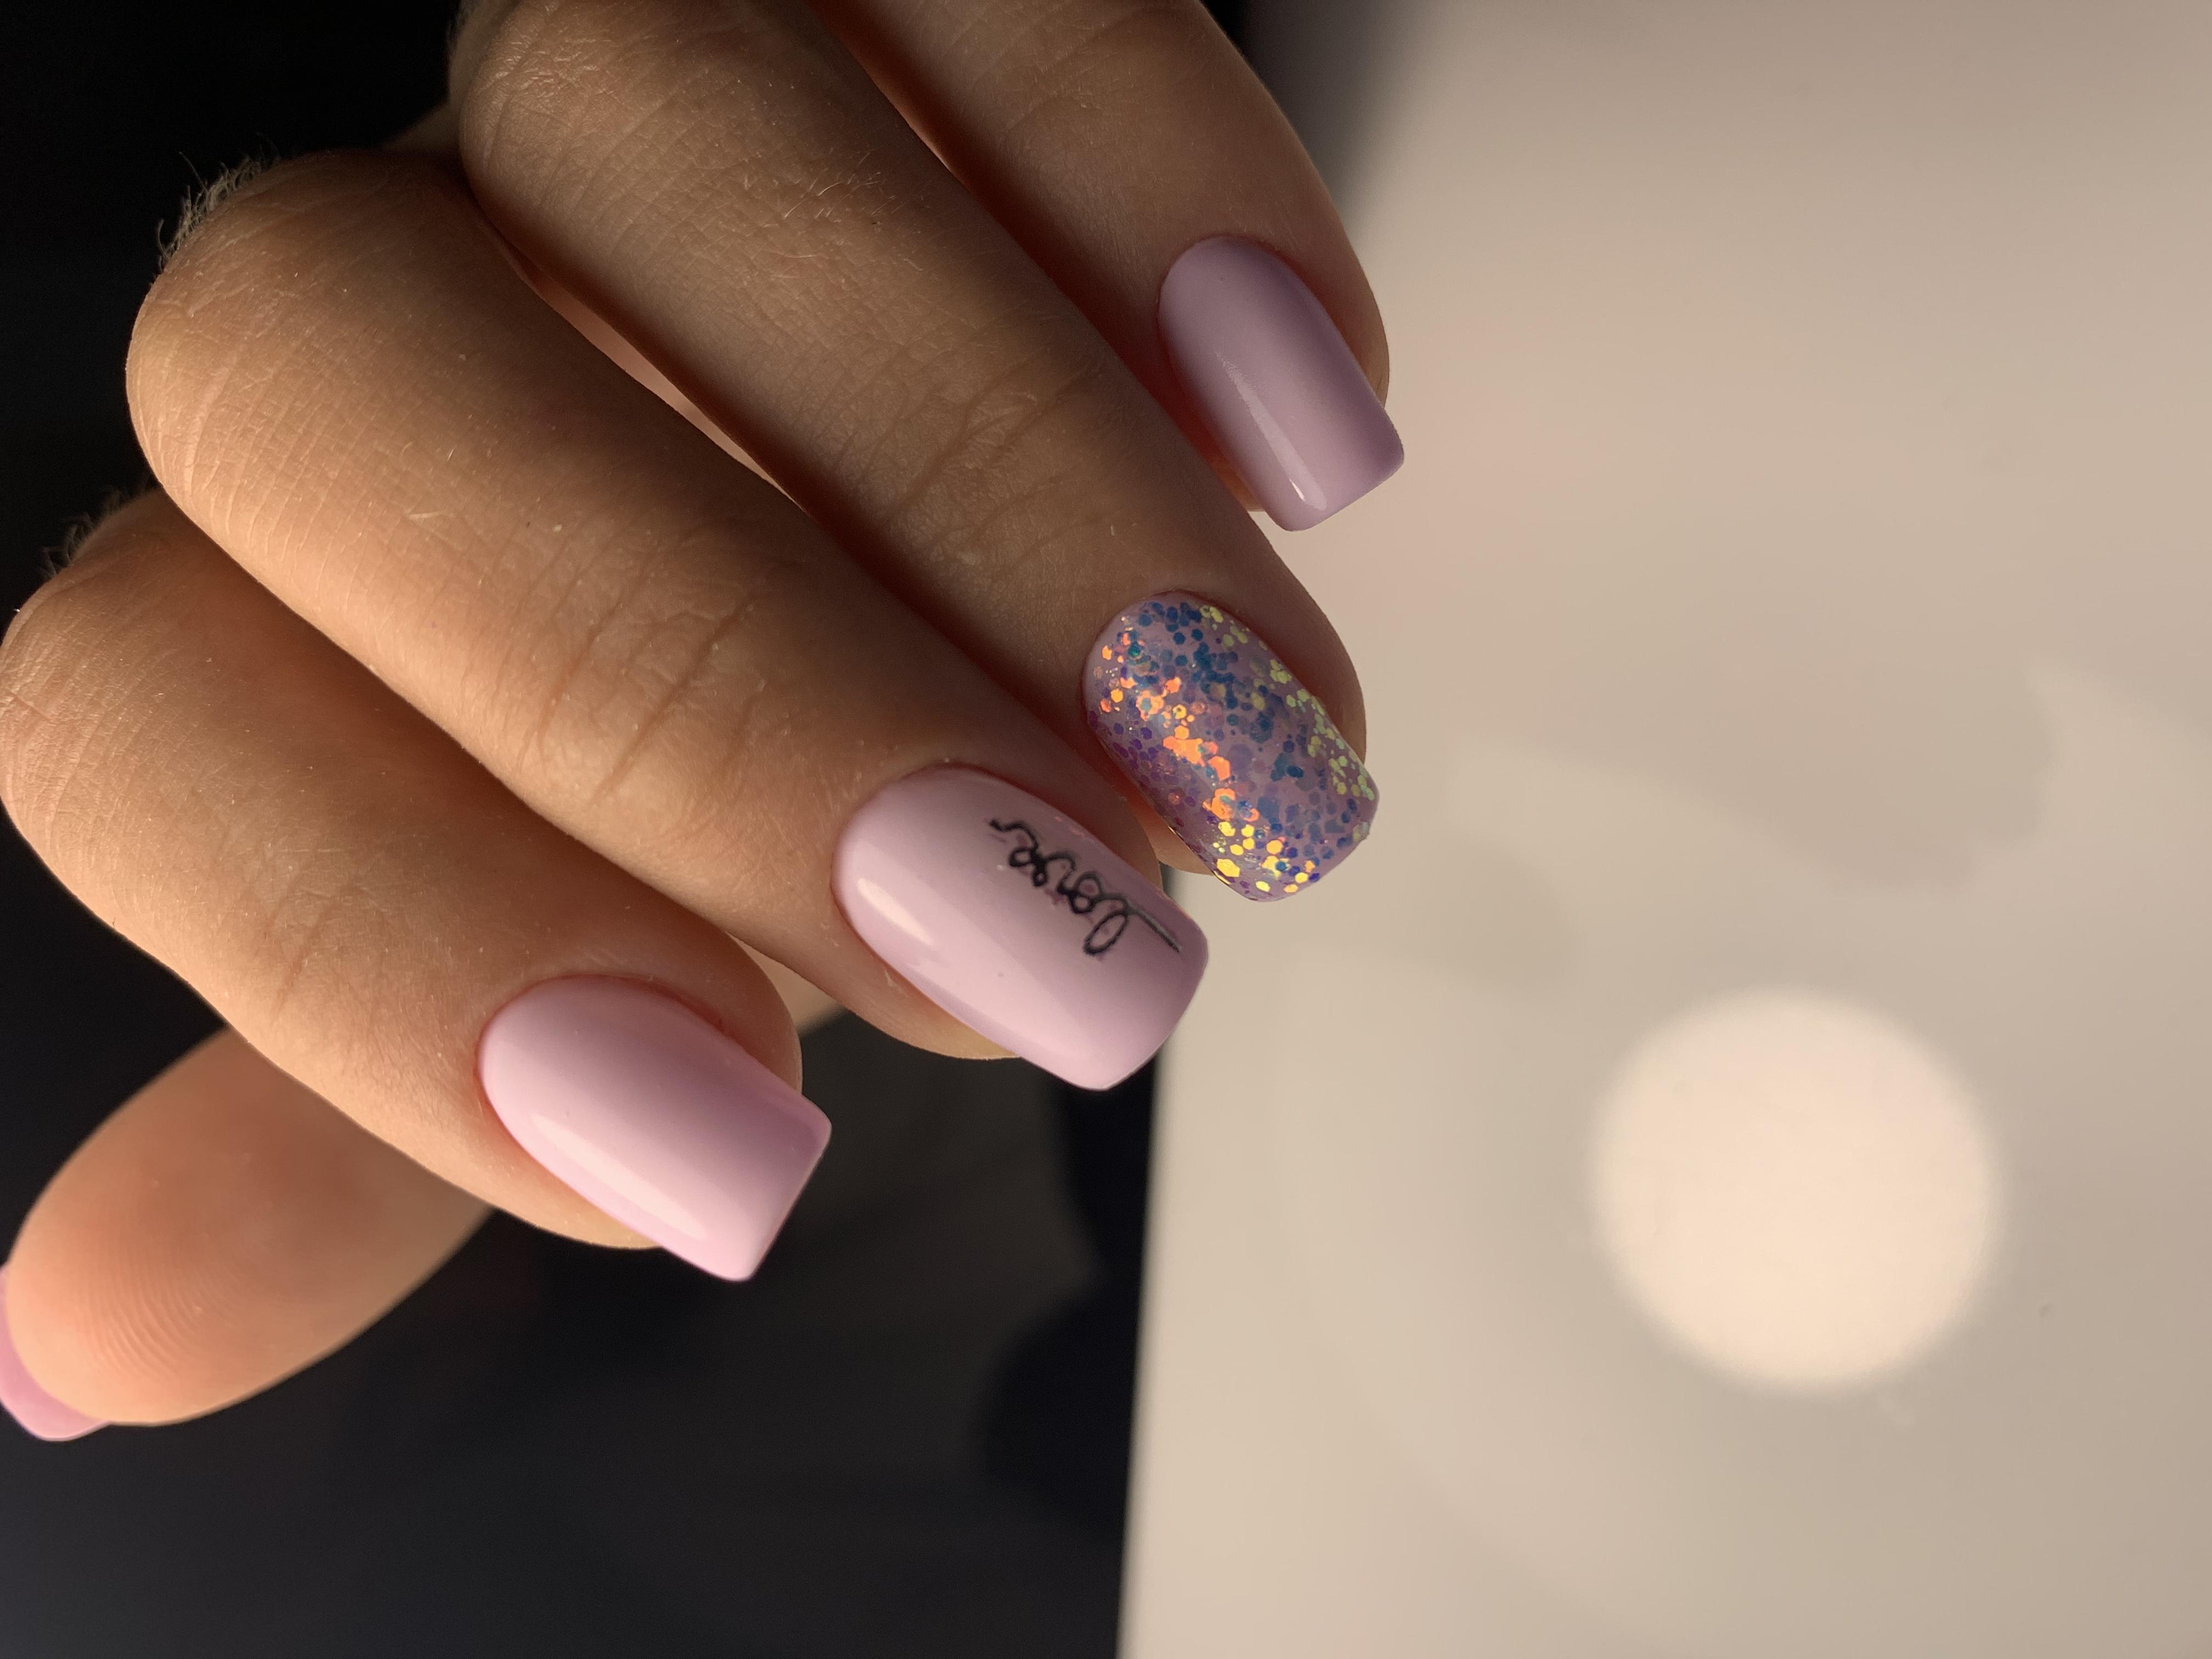 Маникюр с кмифубуки и надписями в розовом цвете на короткие ногти.